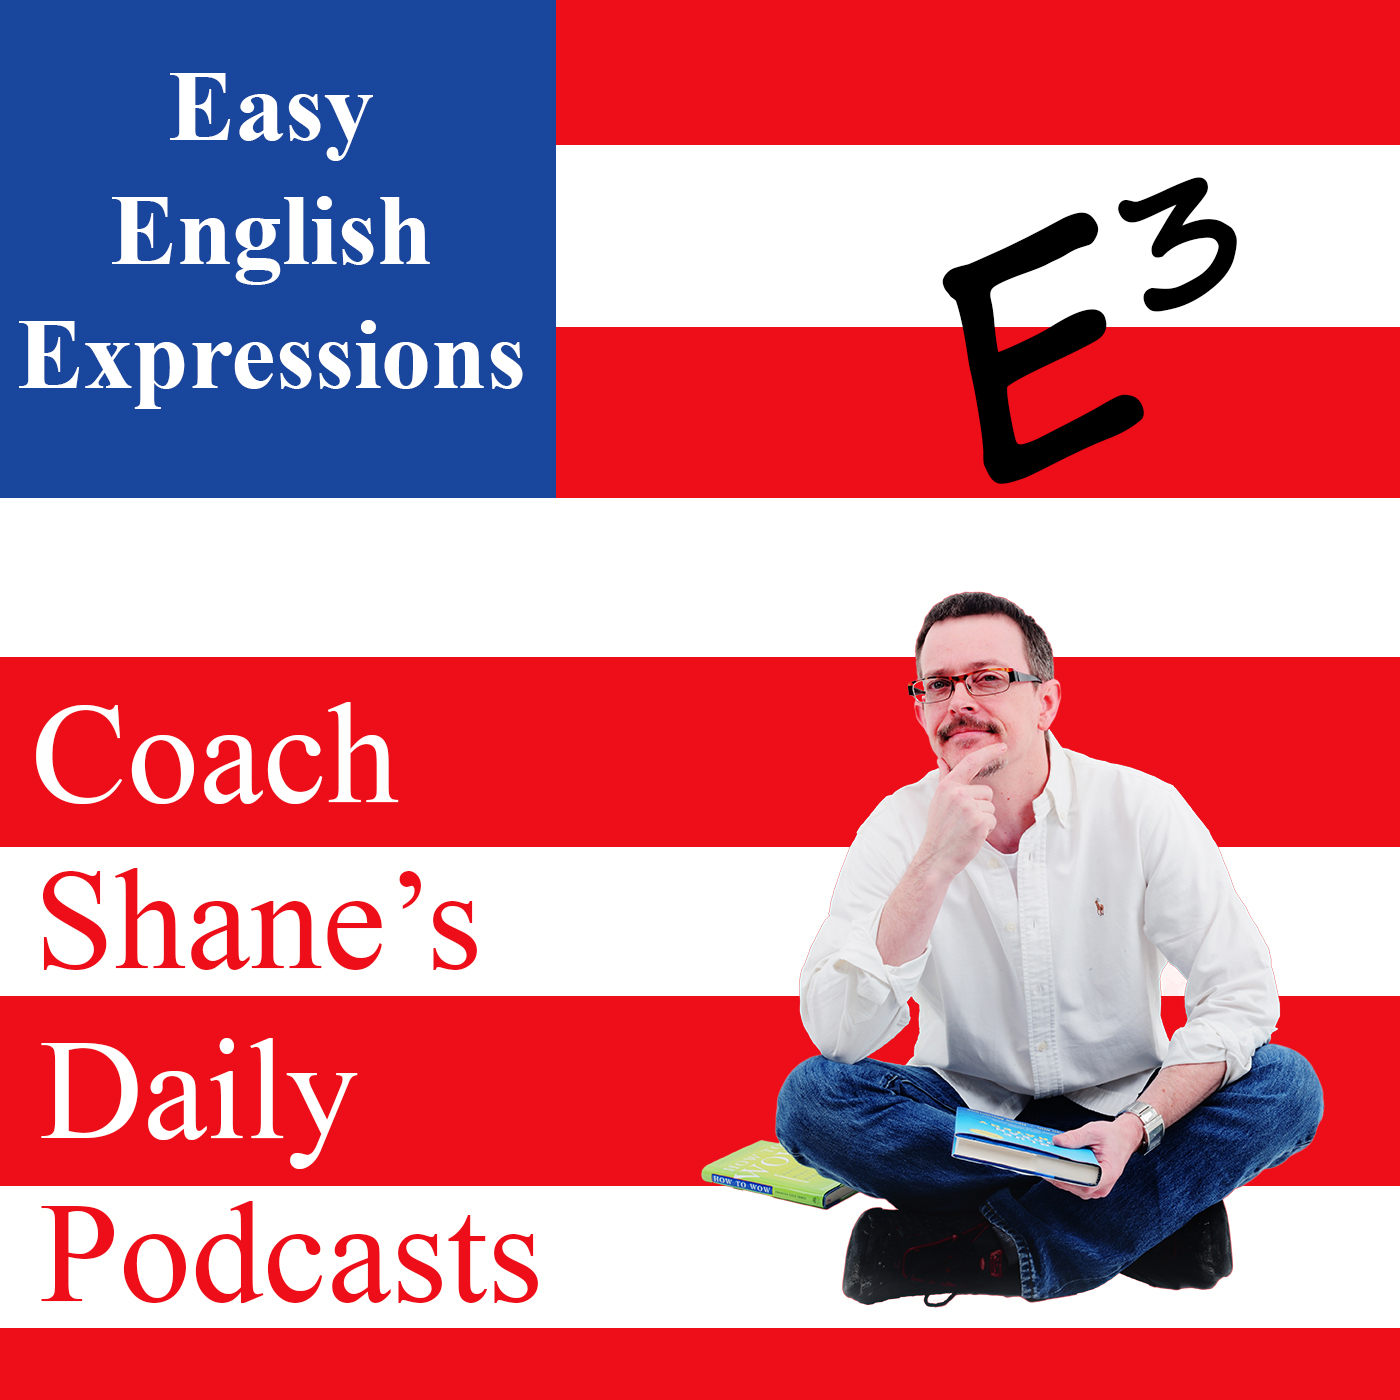 40 Daily Easy English Expression PODCAST—...already!